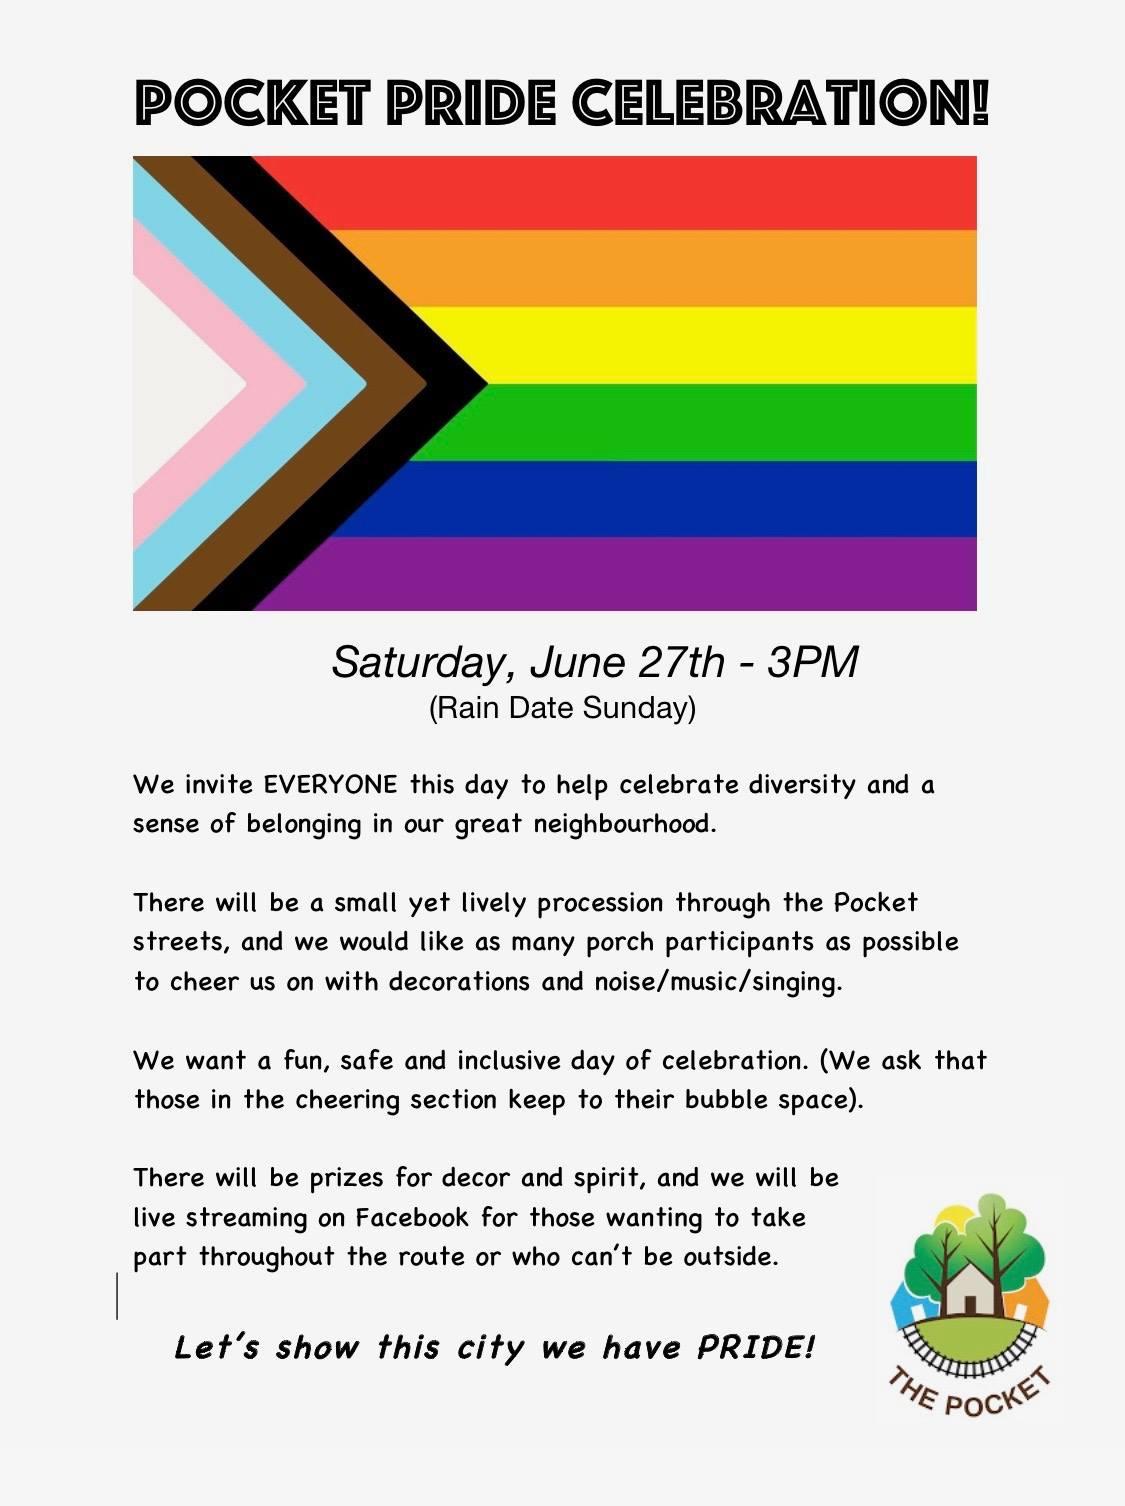 pocket pride celebration 2020